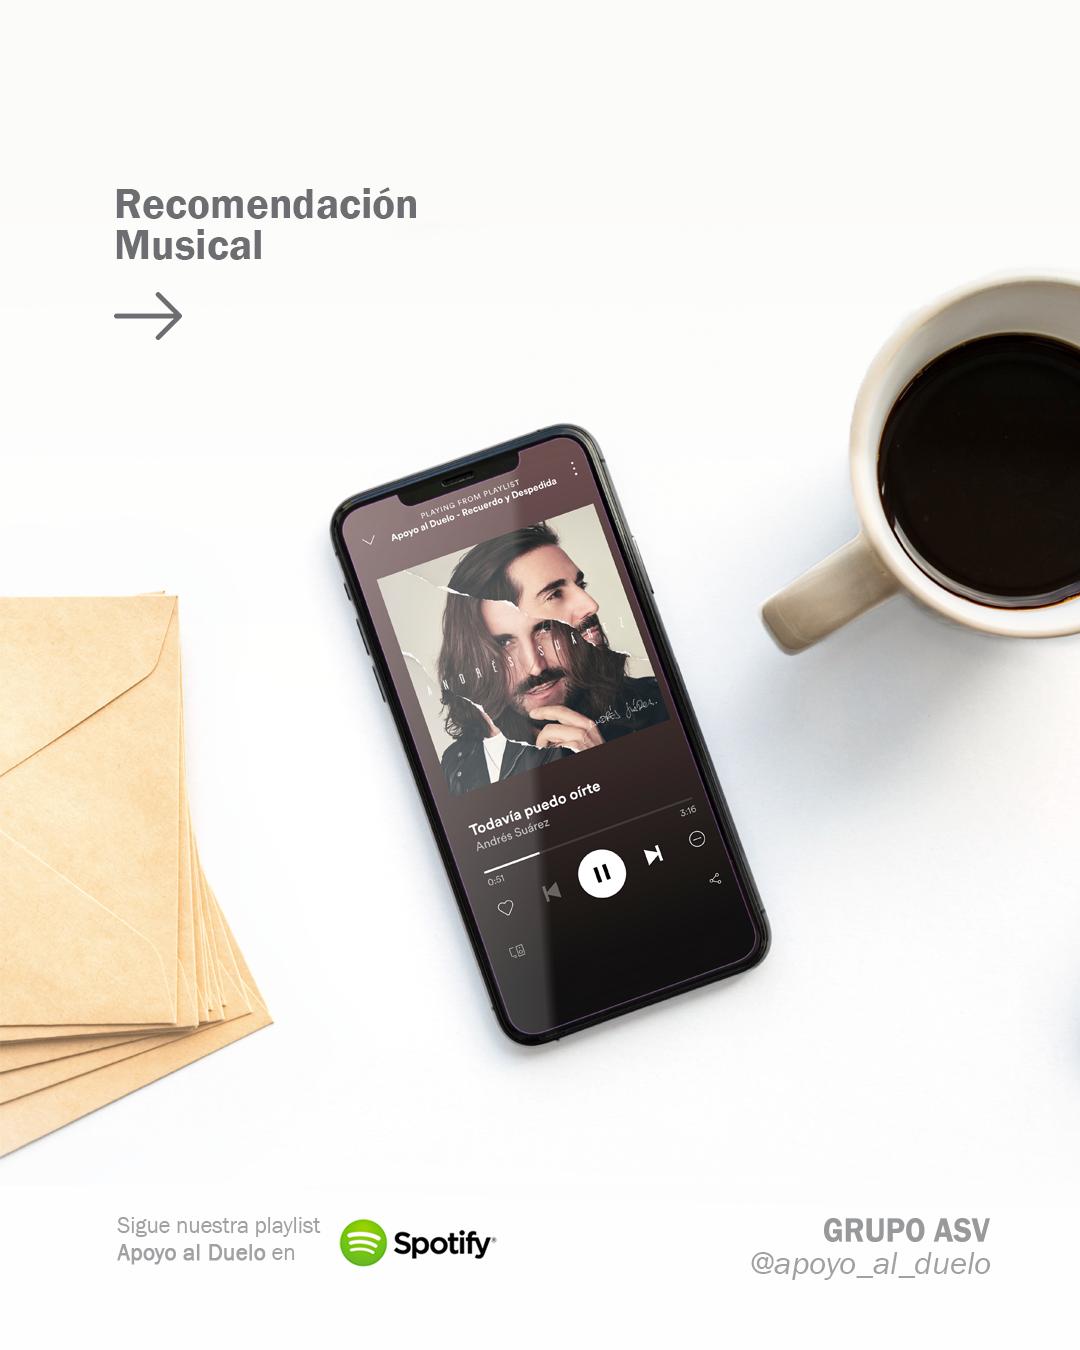 taza de cafe sobres y telefono movil con portada de todavia puedo oirte de andres suarez